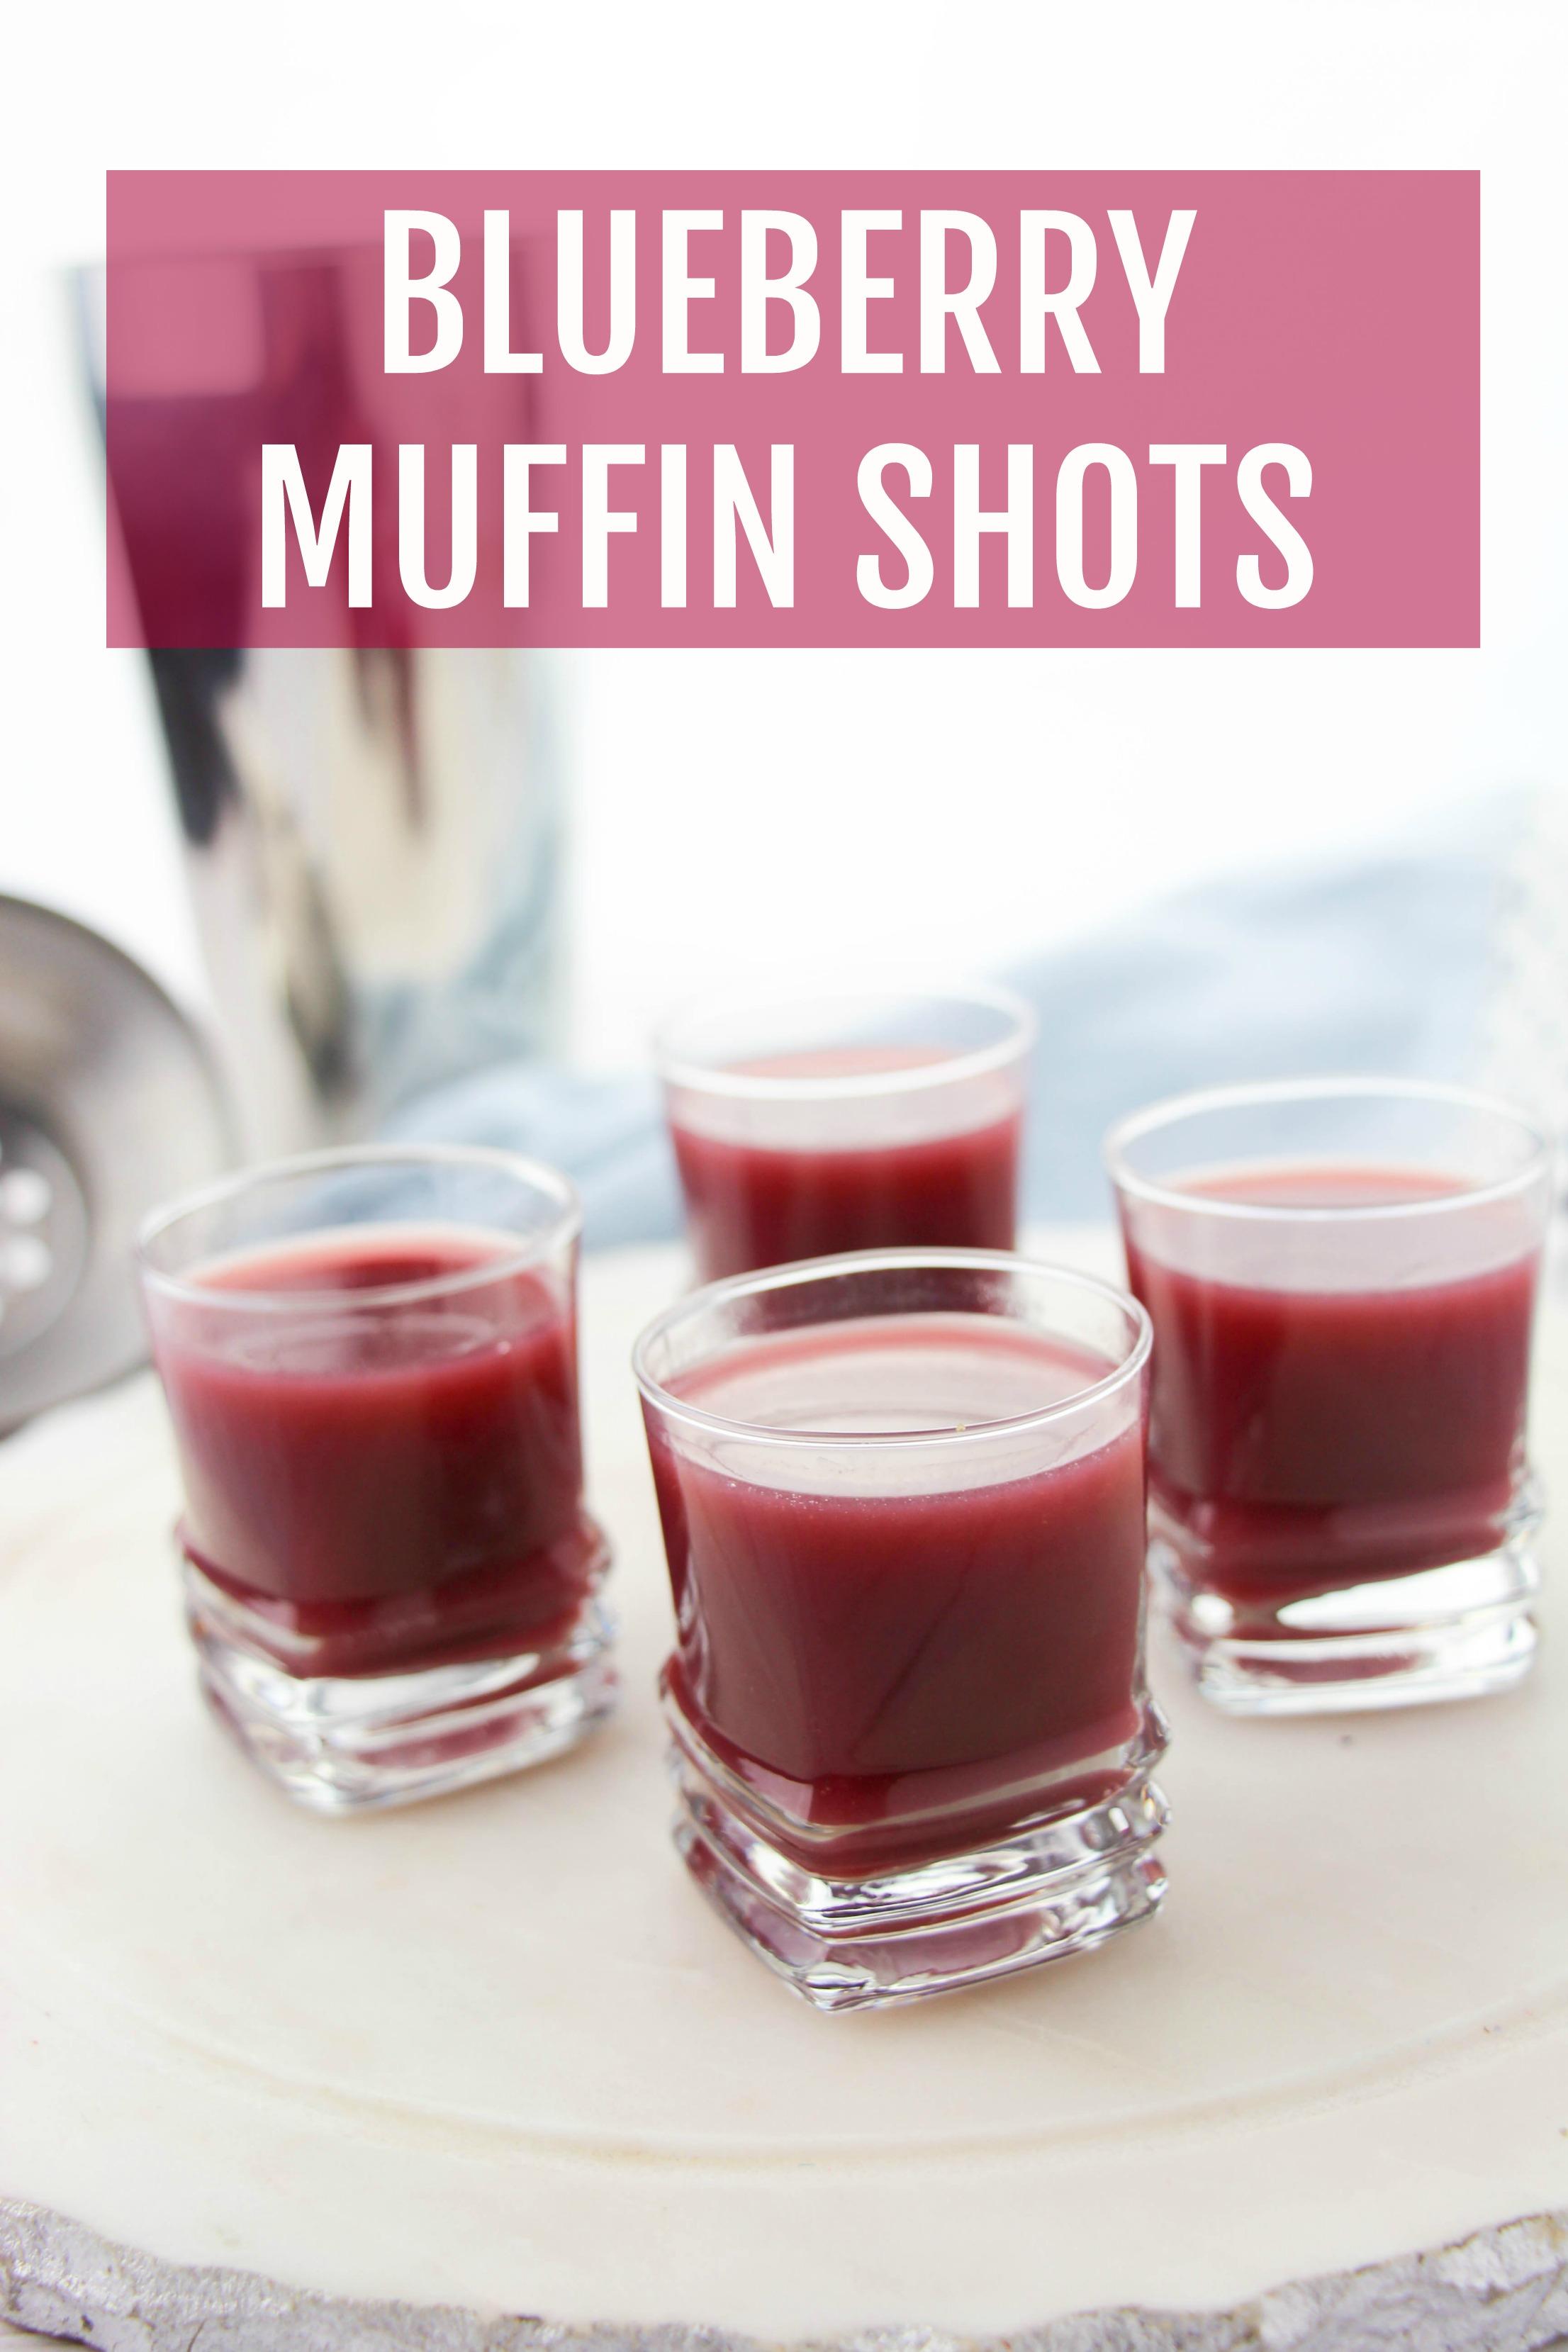 blueberry muffin shots recipe